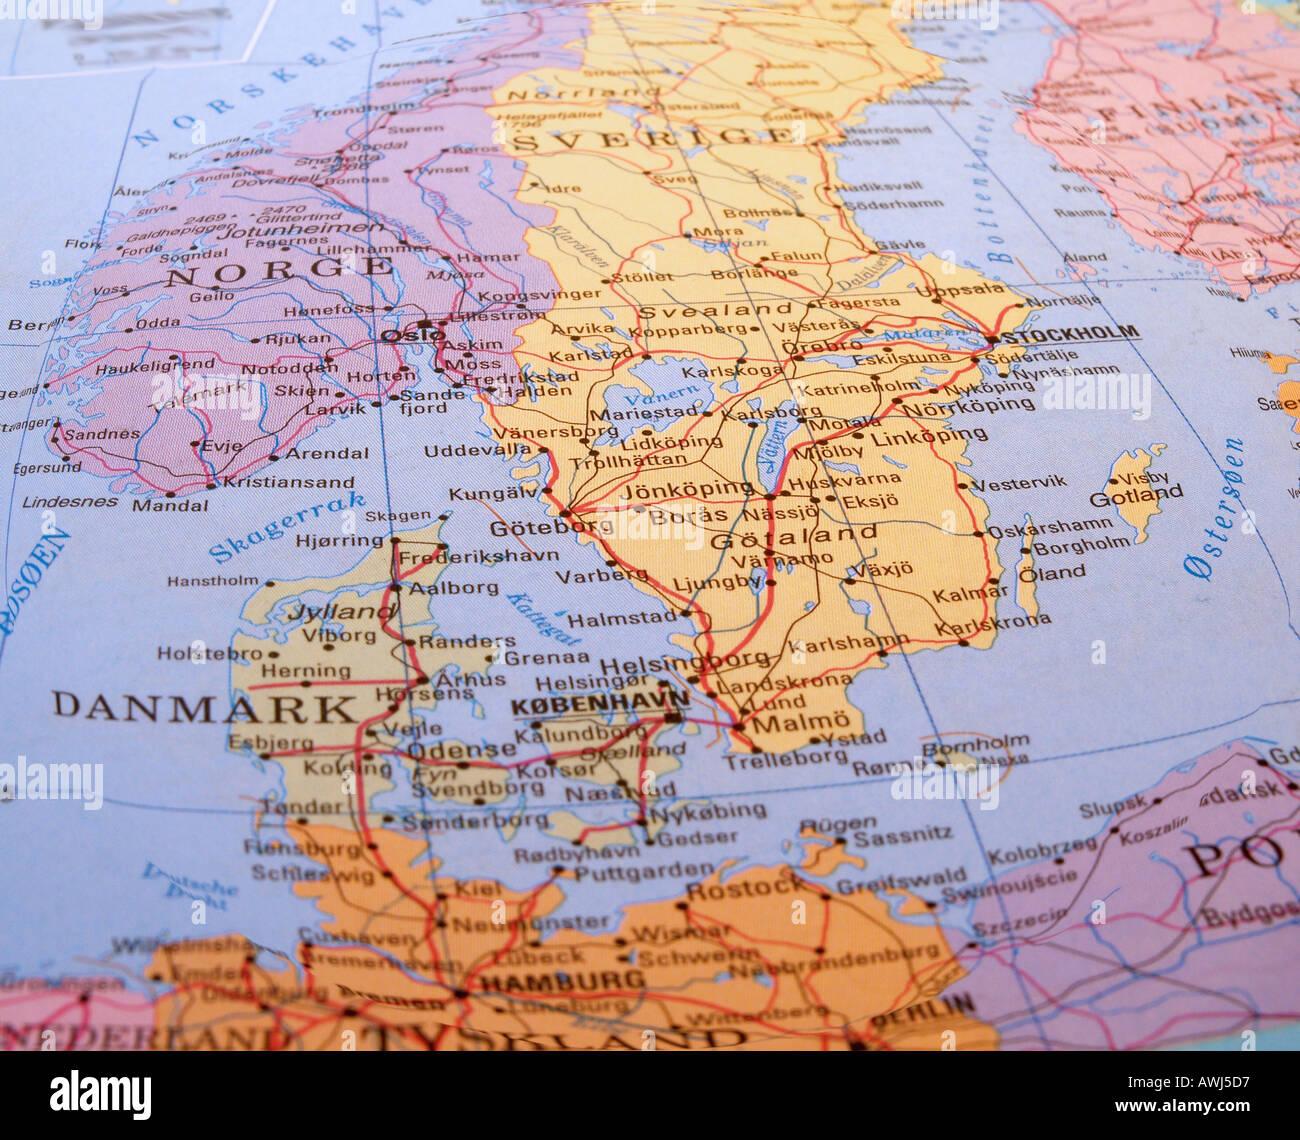 Dänemark Karte Skandinavien Stockfoto Bild 3073494 Alamy